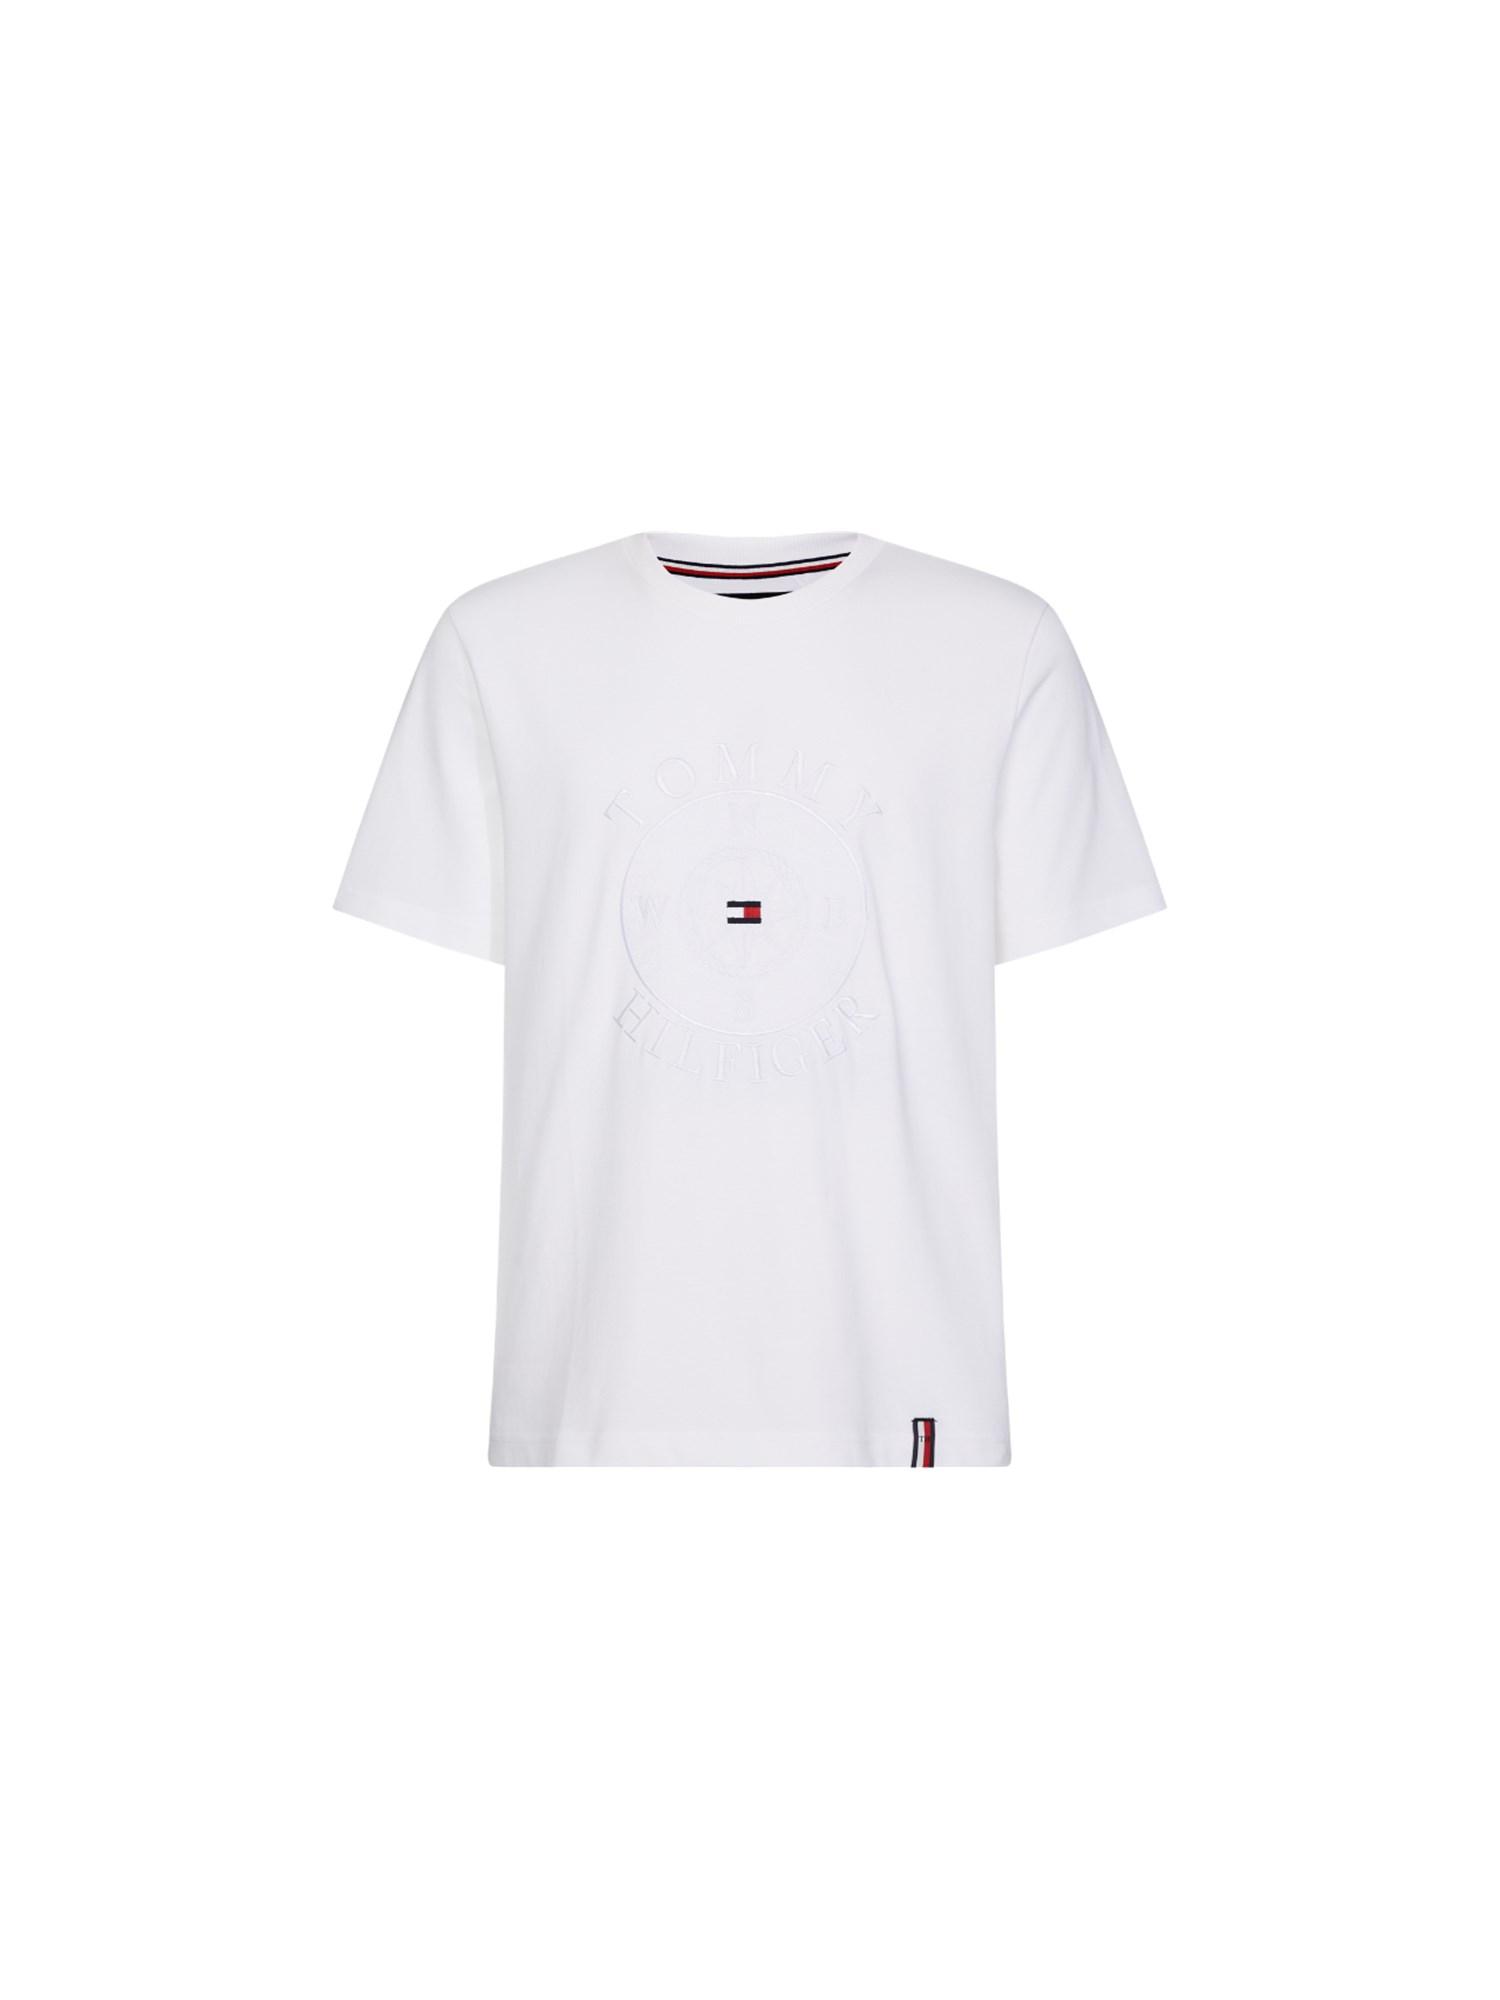 T shirt Uomo Uomo Tommy Hilfiger